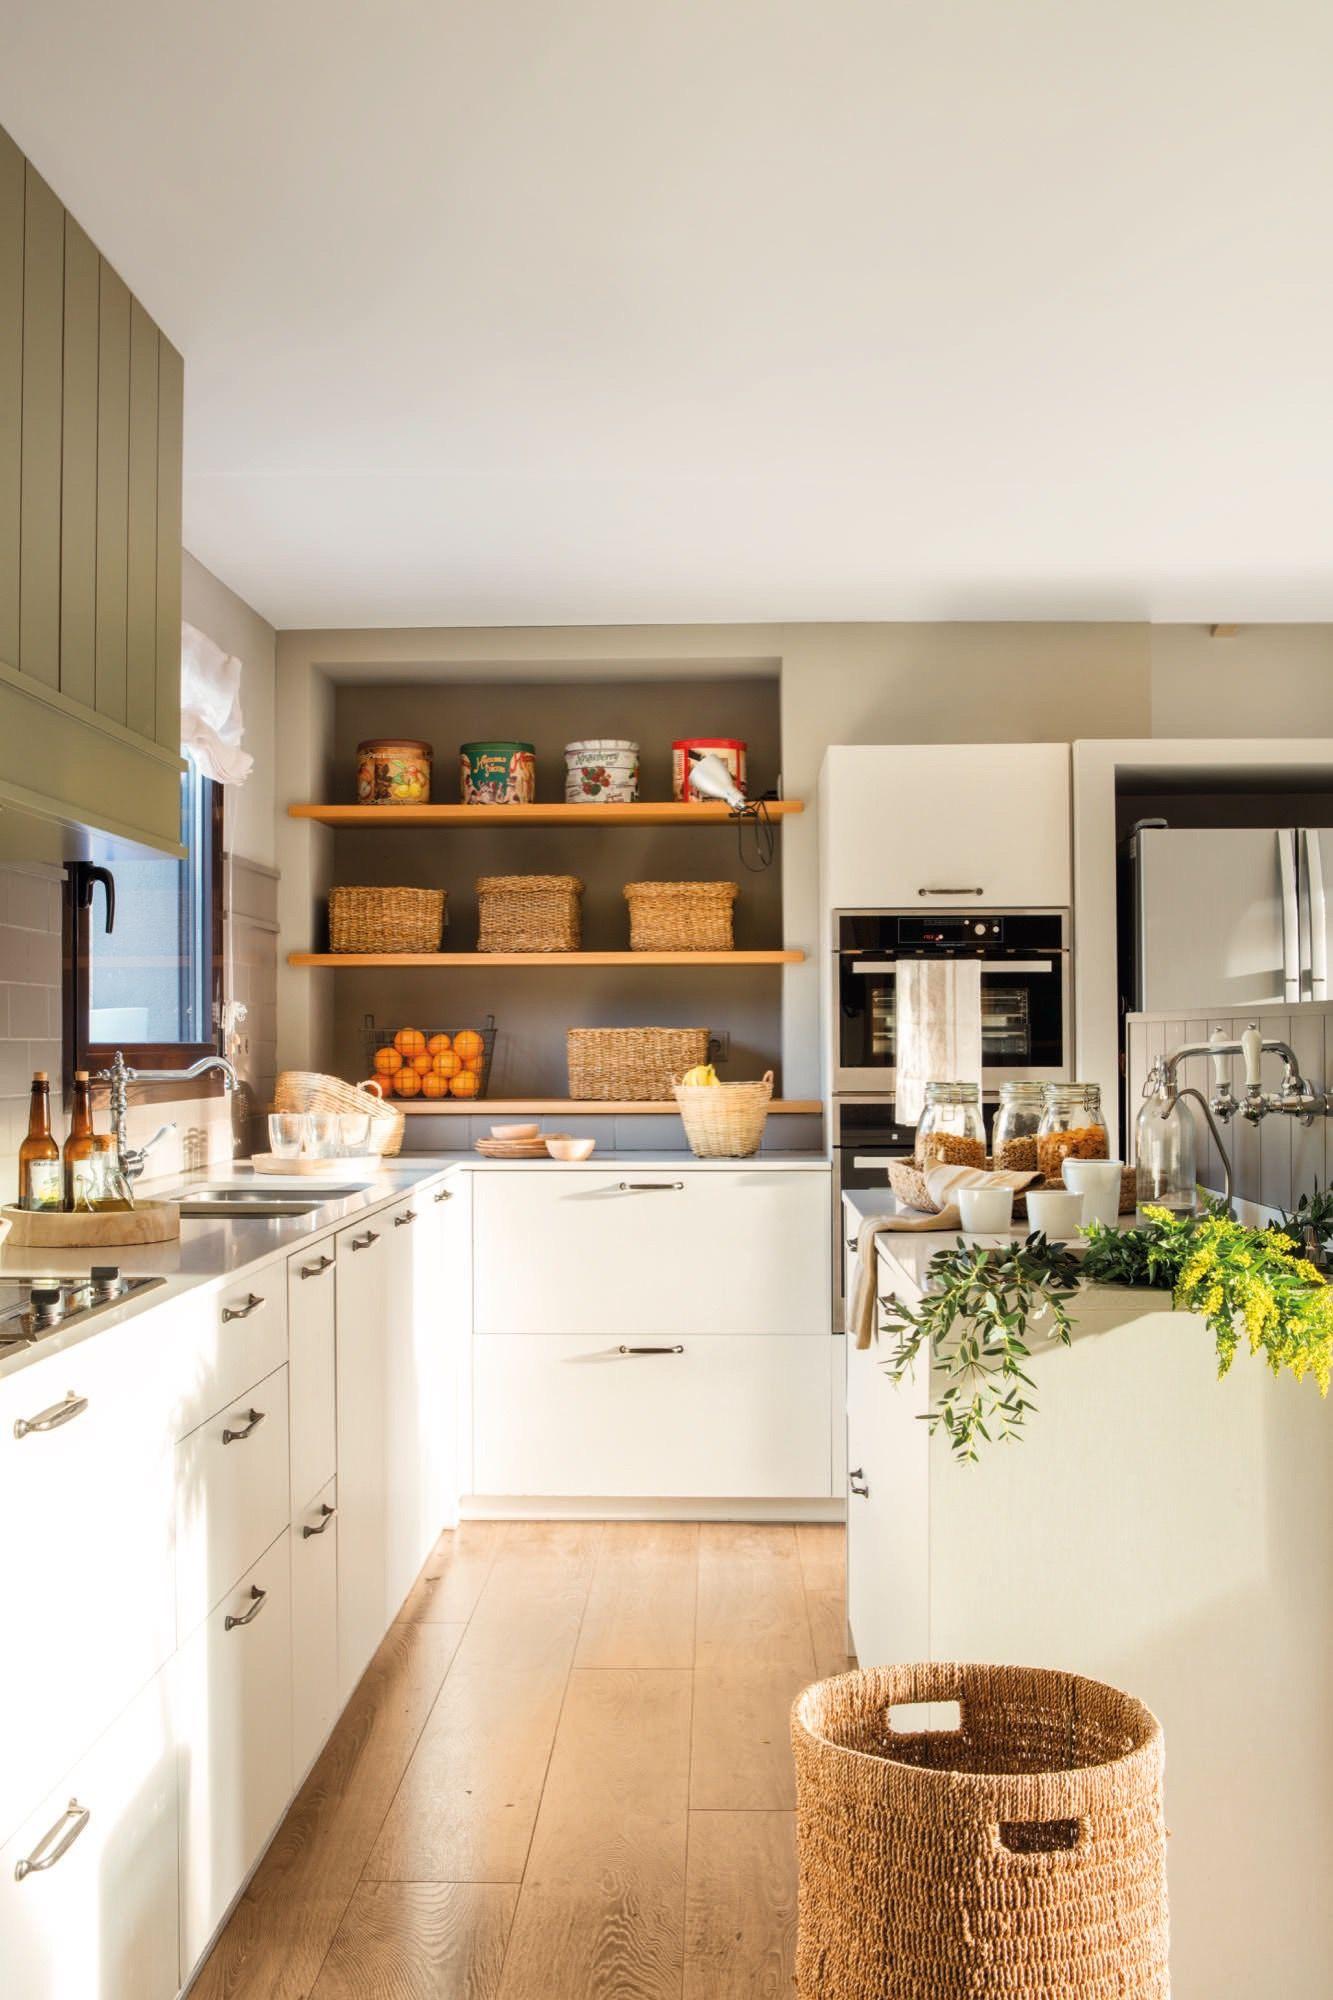 cocina blanca con paredes pintadas de gris | Rustico chic ...